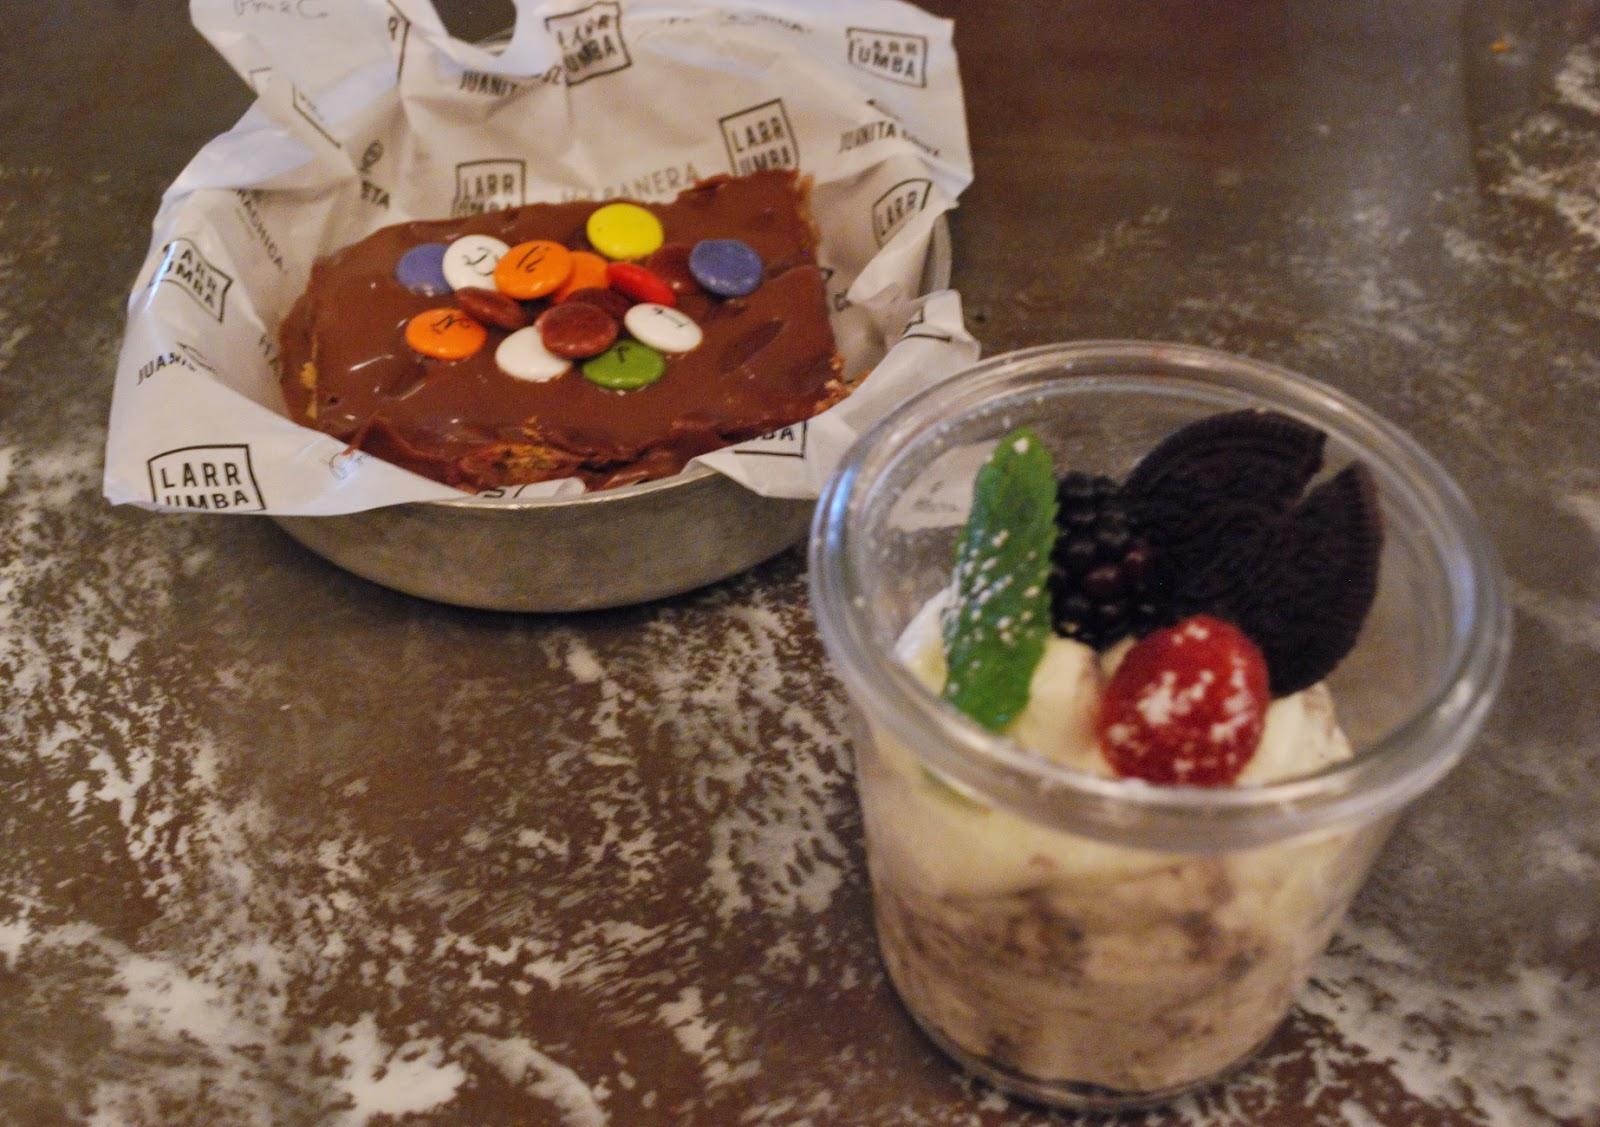 restaurante perrachica madrid postre food blog